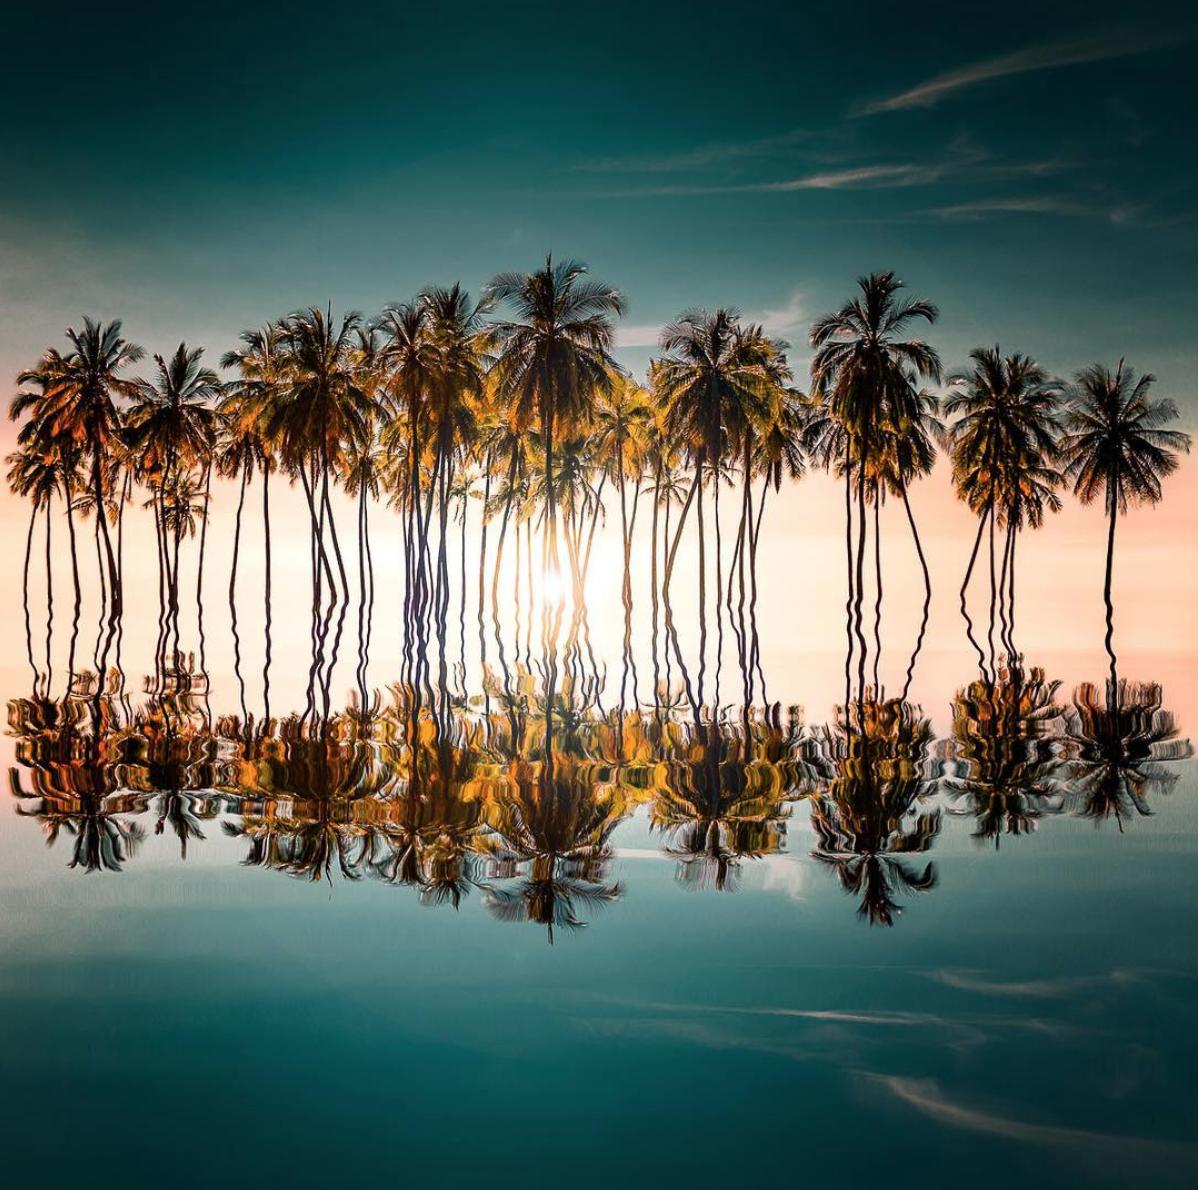 Brandon Verdura - favourite ocean images of 2019.png